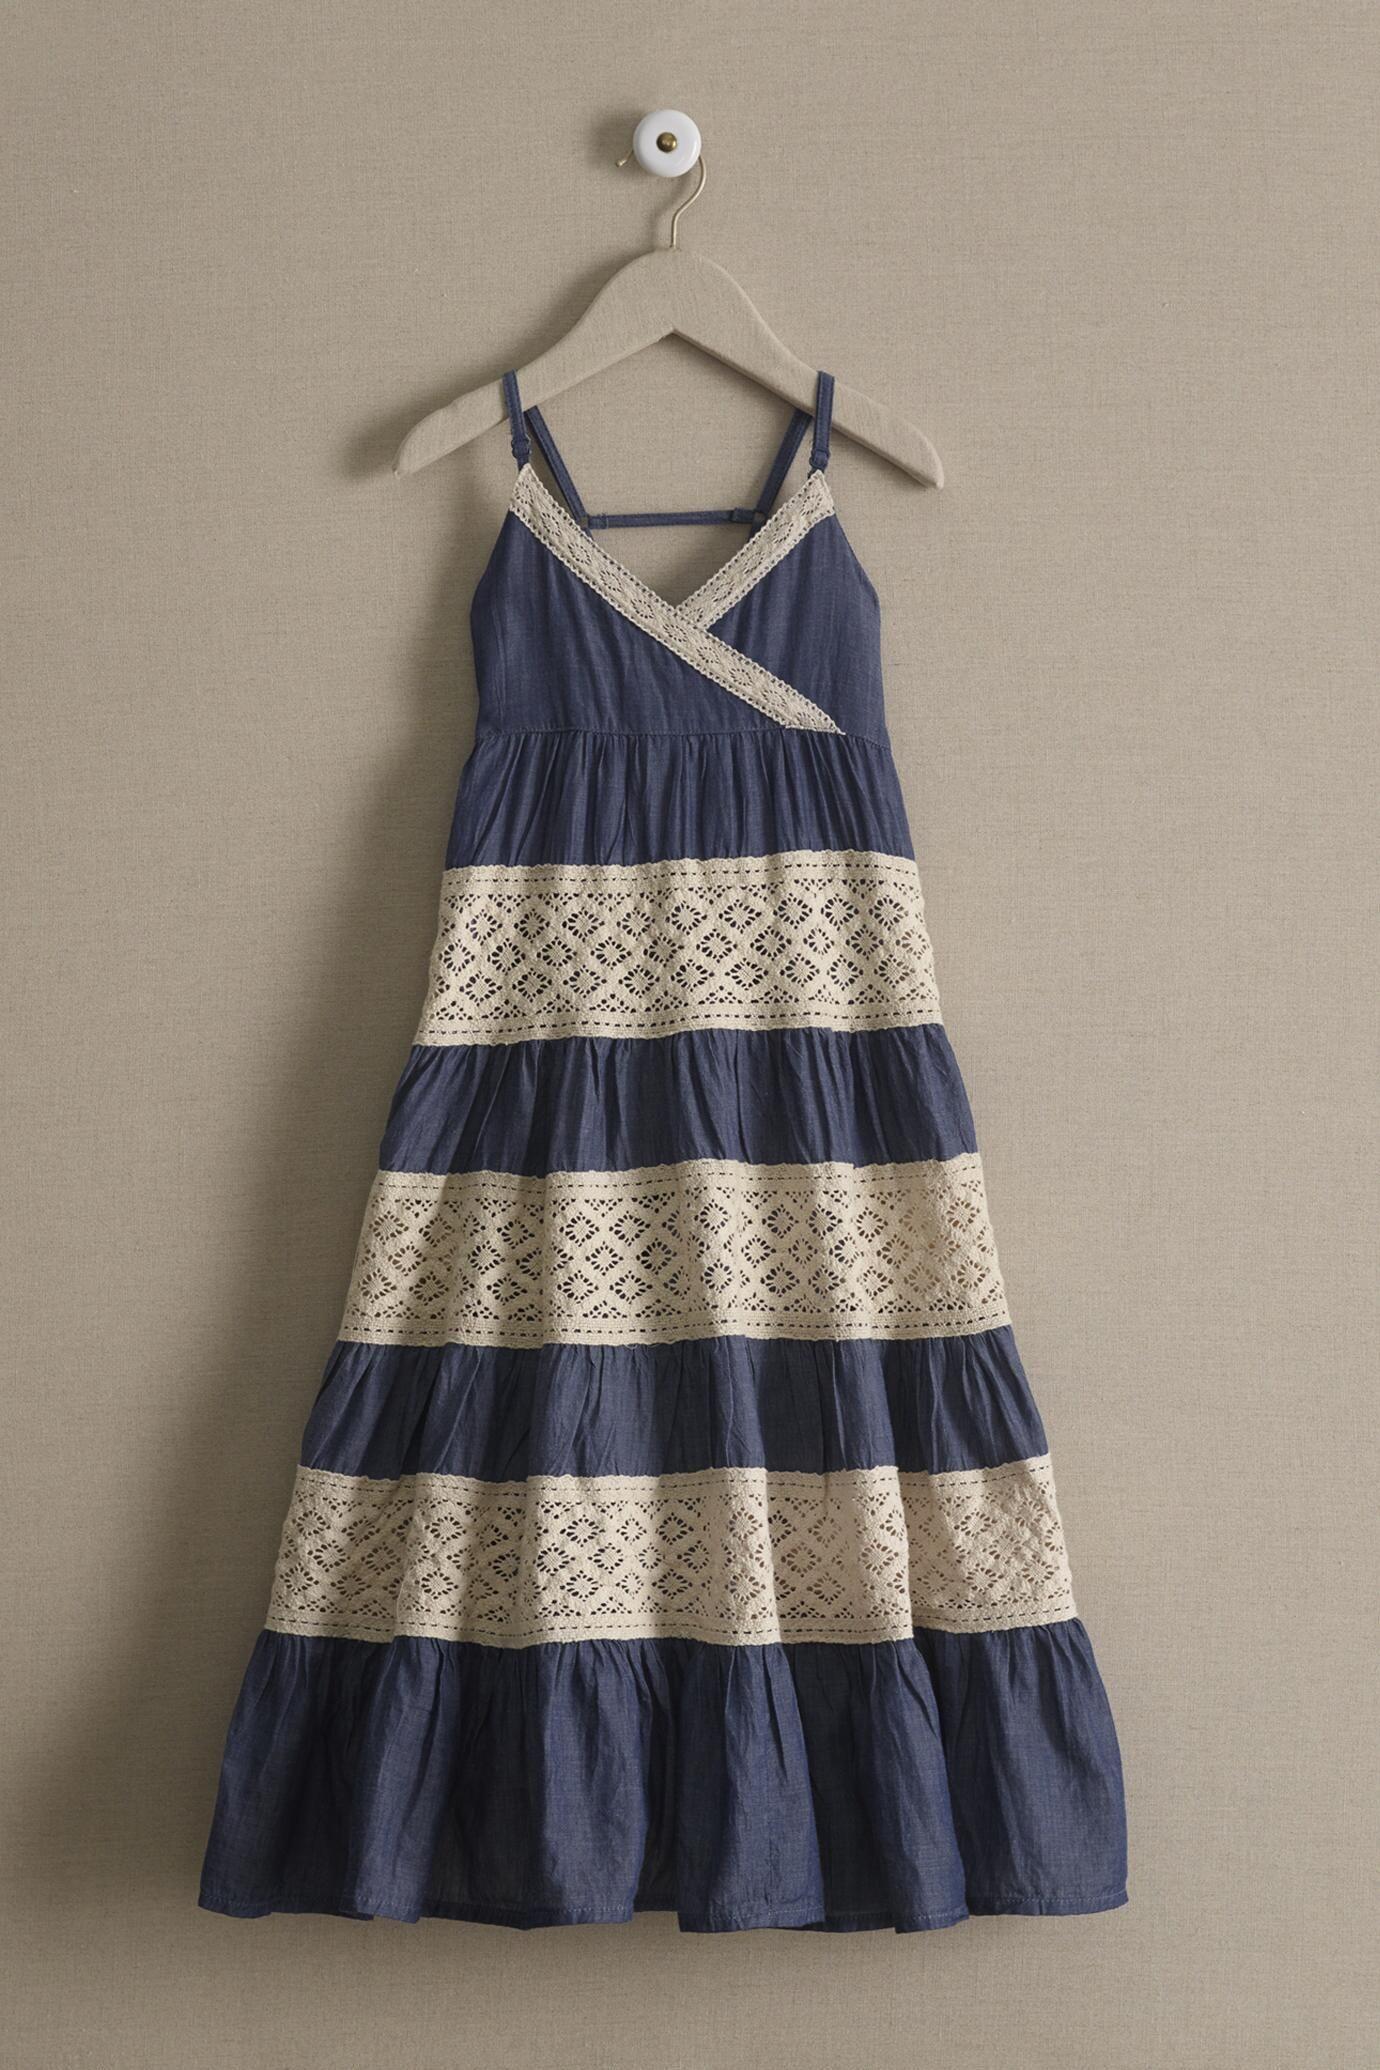 Girls lace maxi dress torieona pinterest dresses girls